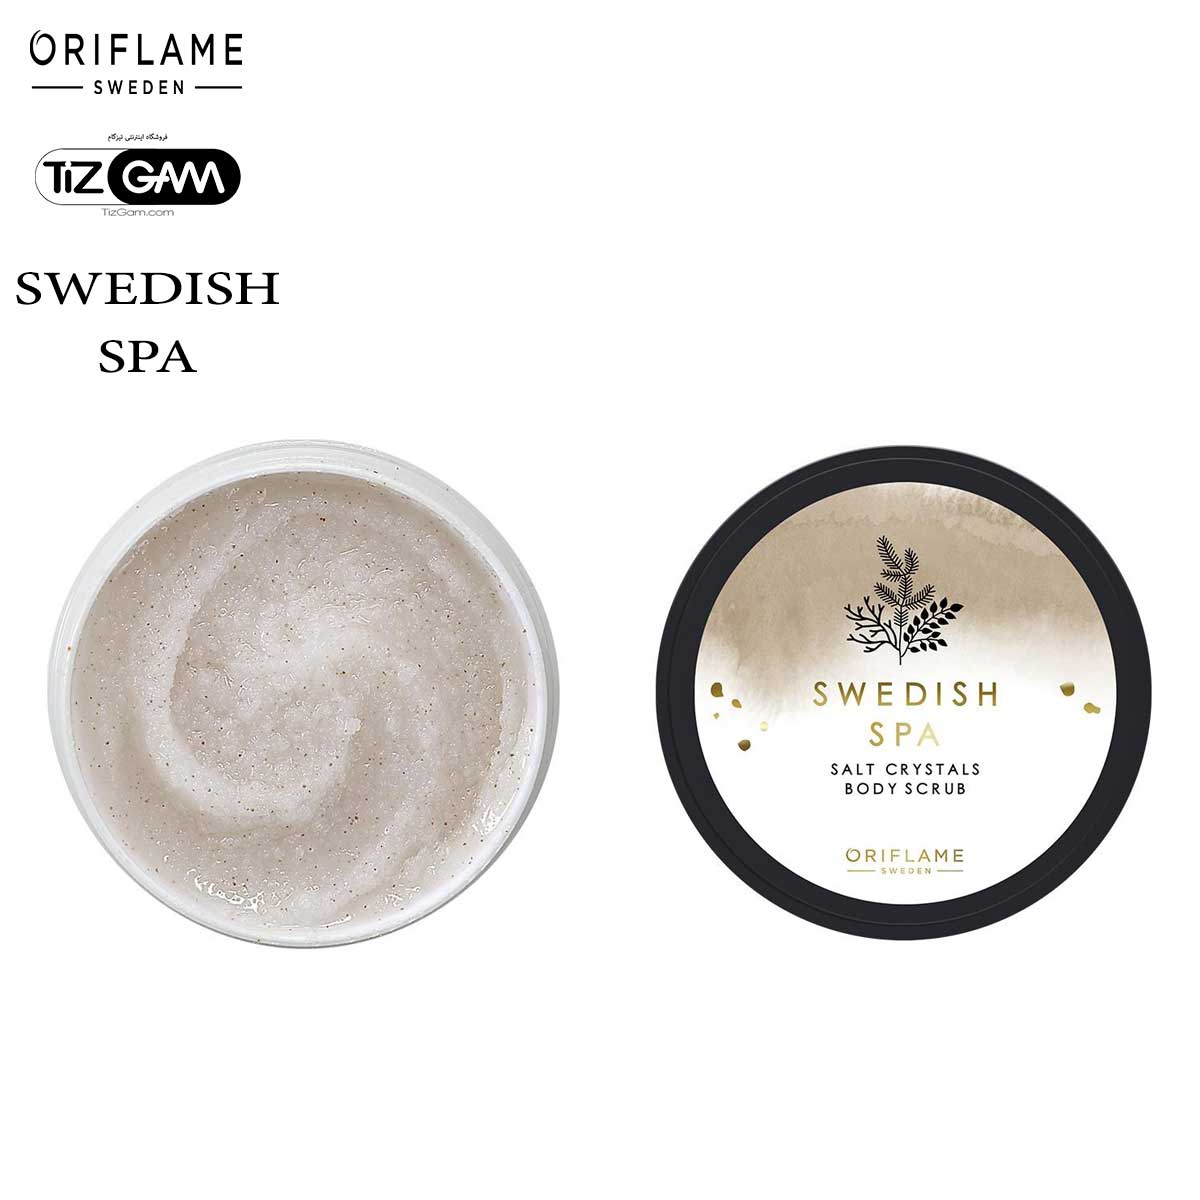 Oriflame Swedish Spa Salt Crystals Body Scrub tizgam اسکراب بدن کریستال نمک دریای سوئدیش اسپا اوریفلیم تیزگام لایه بردار گل